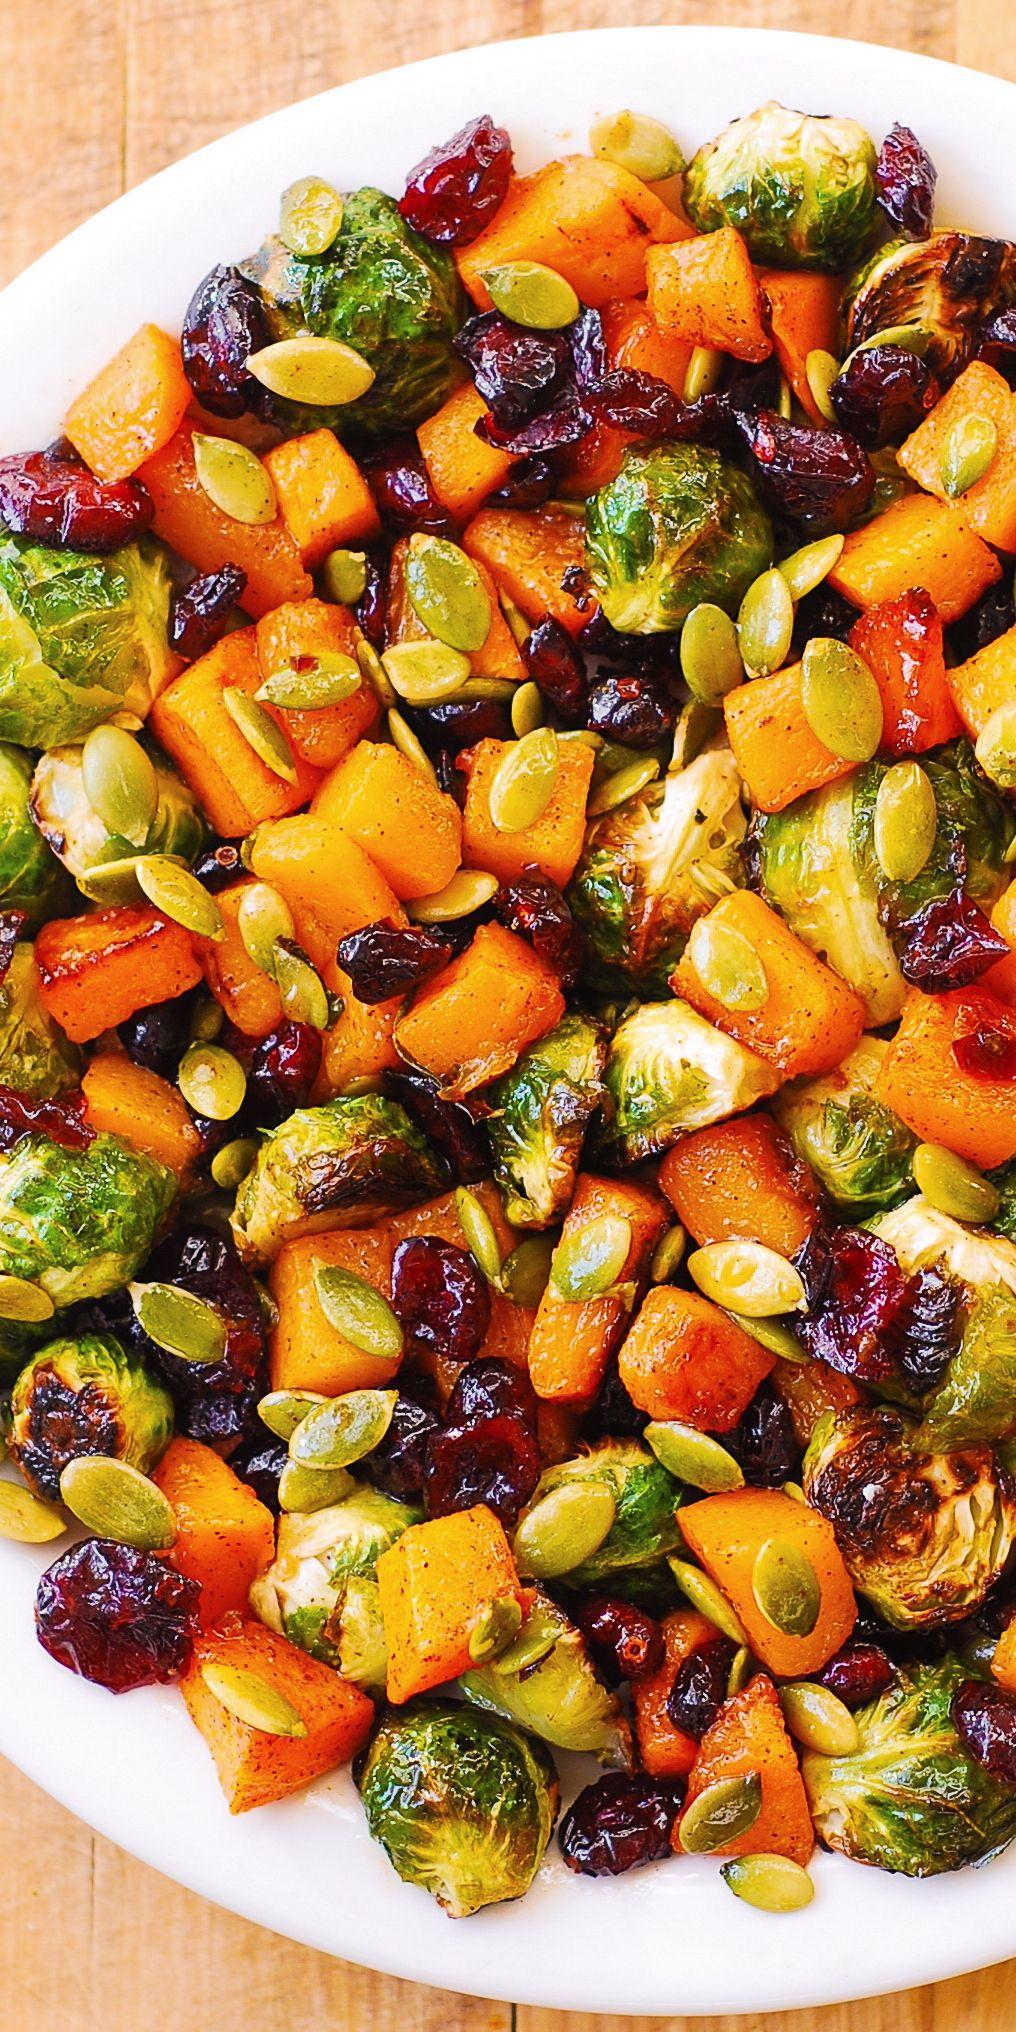 Salad: Butternut Squash, Brussels sprouts, Pumpkin